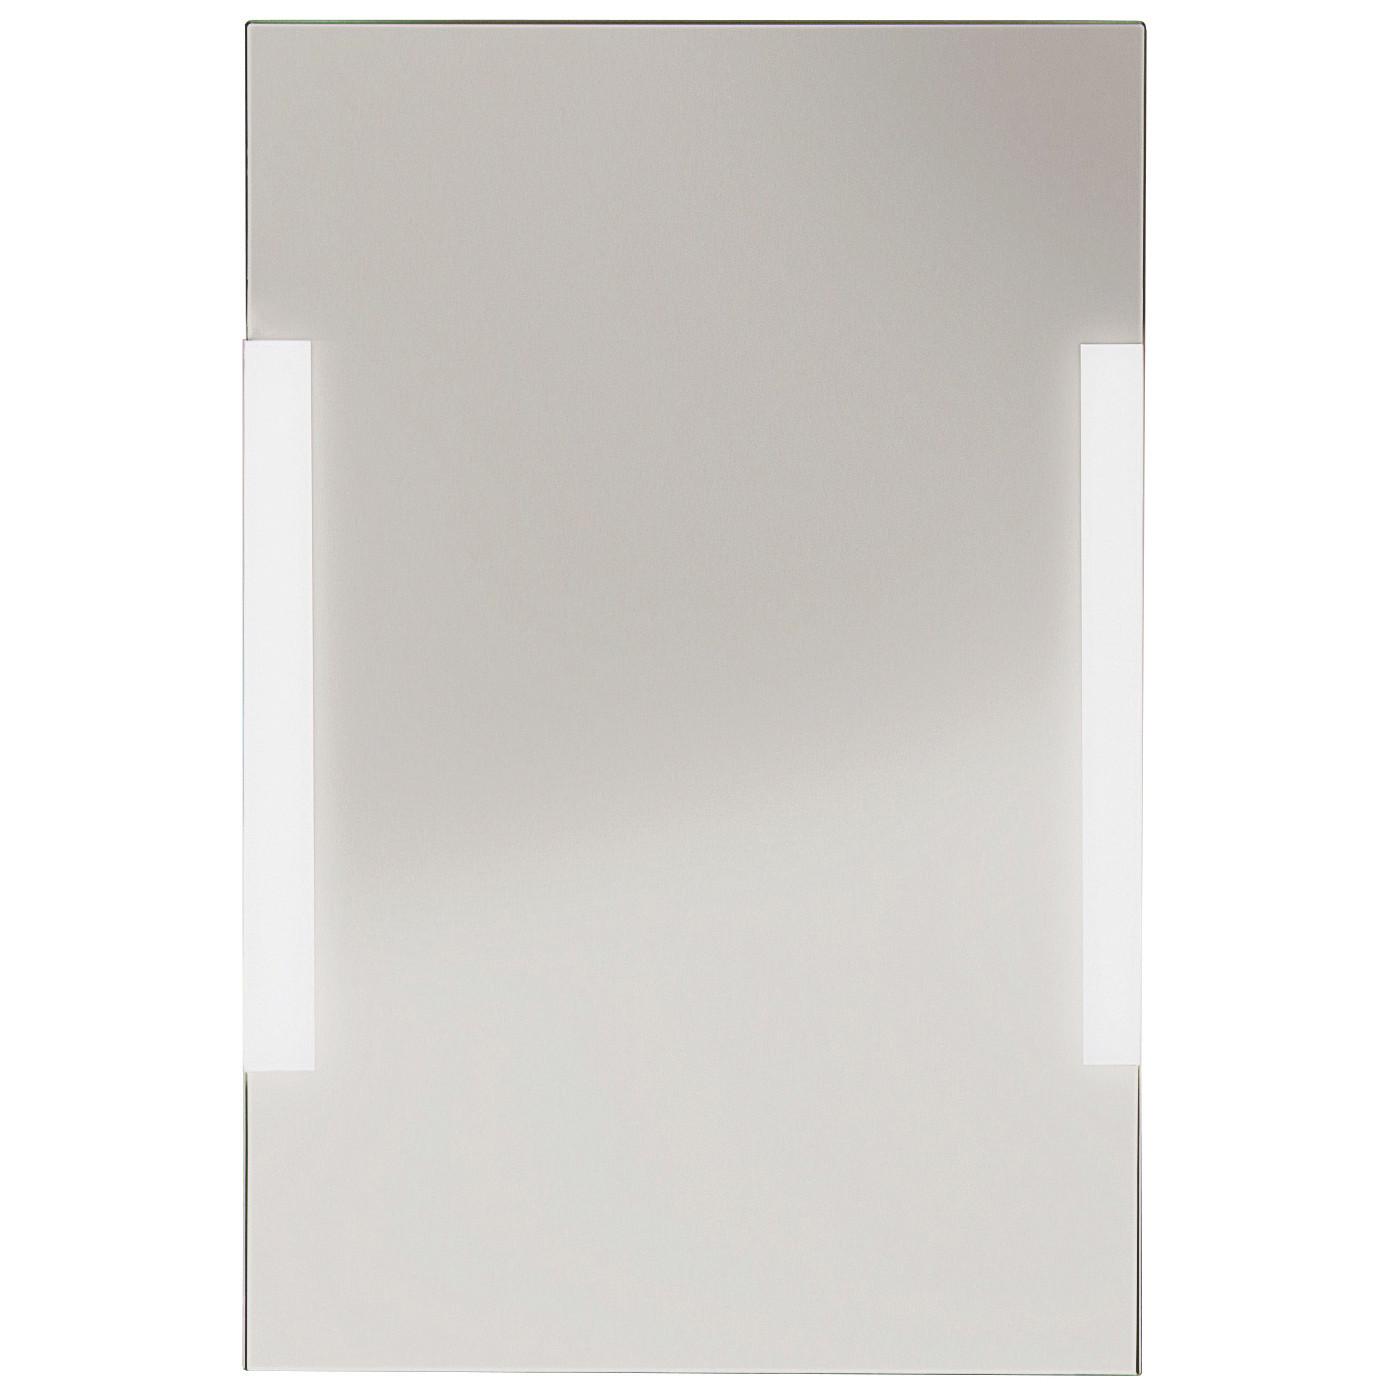 Astro Imola 900 LED mirror wall lamp